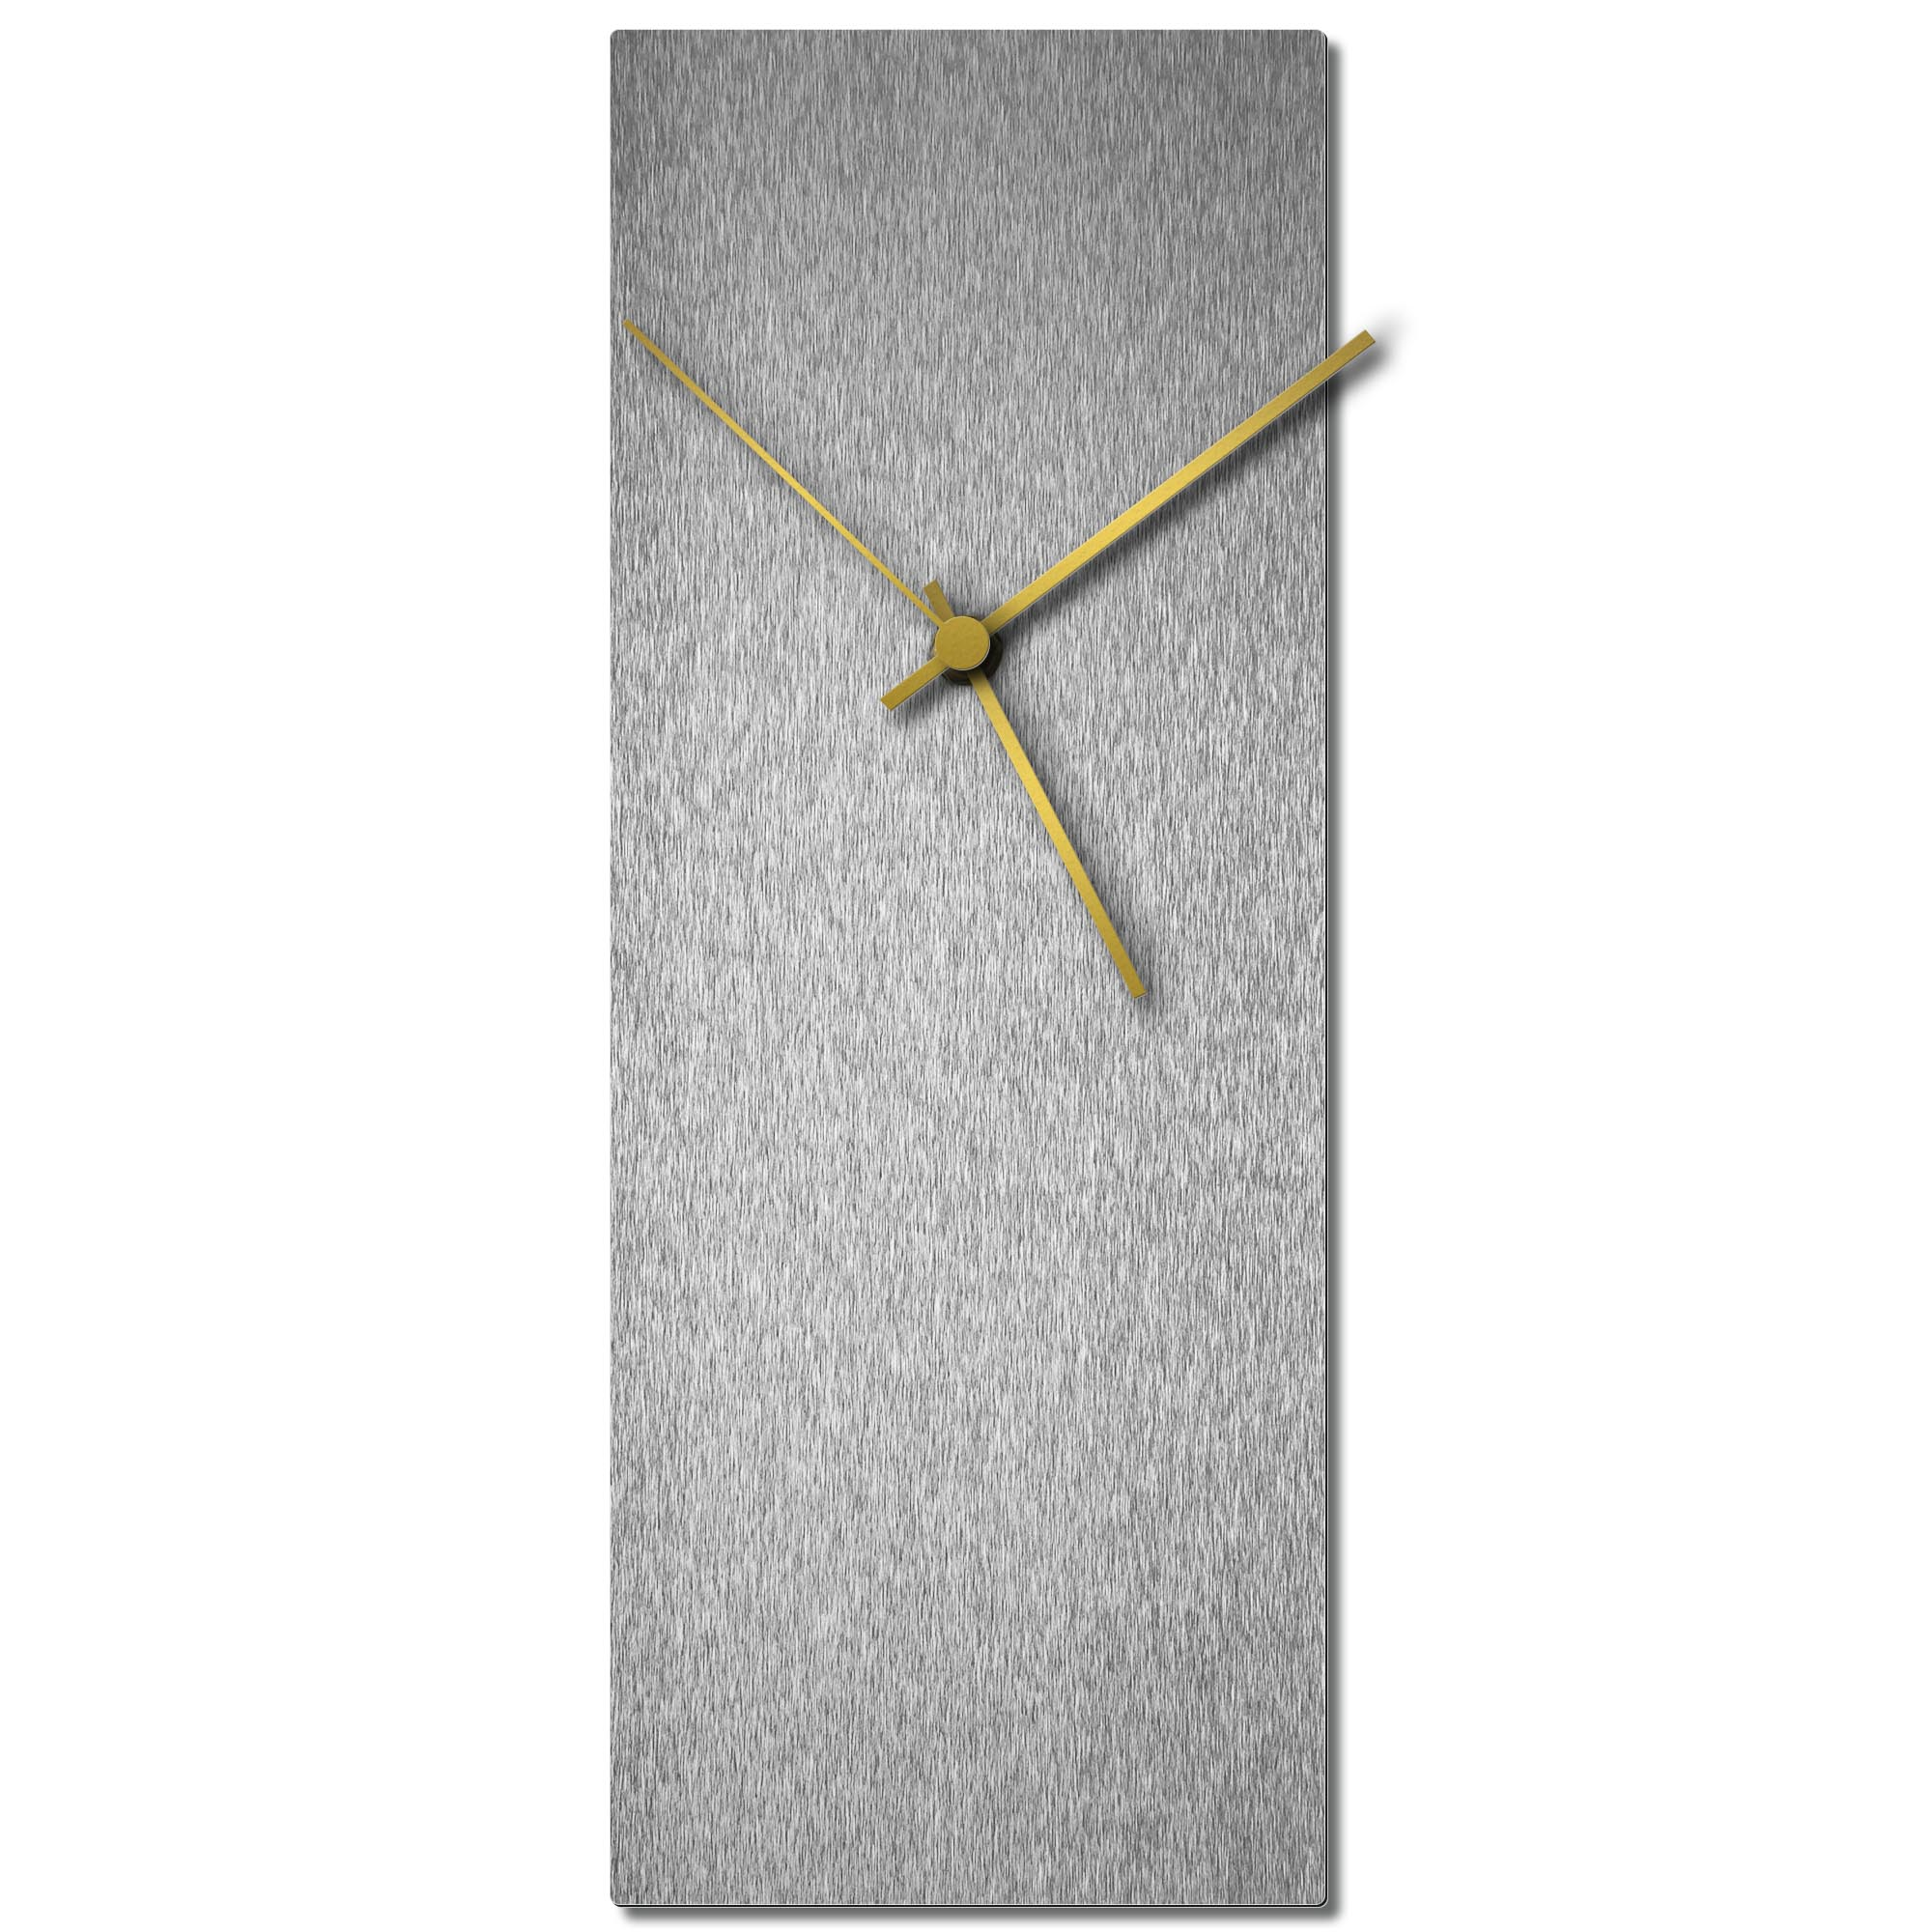 Adam Schwoeppe 'Silversmith Clock Large Gold' Midcentury Modern Style Wall Clock